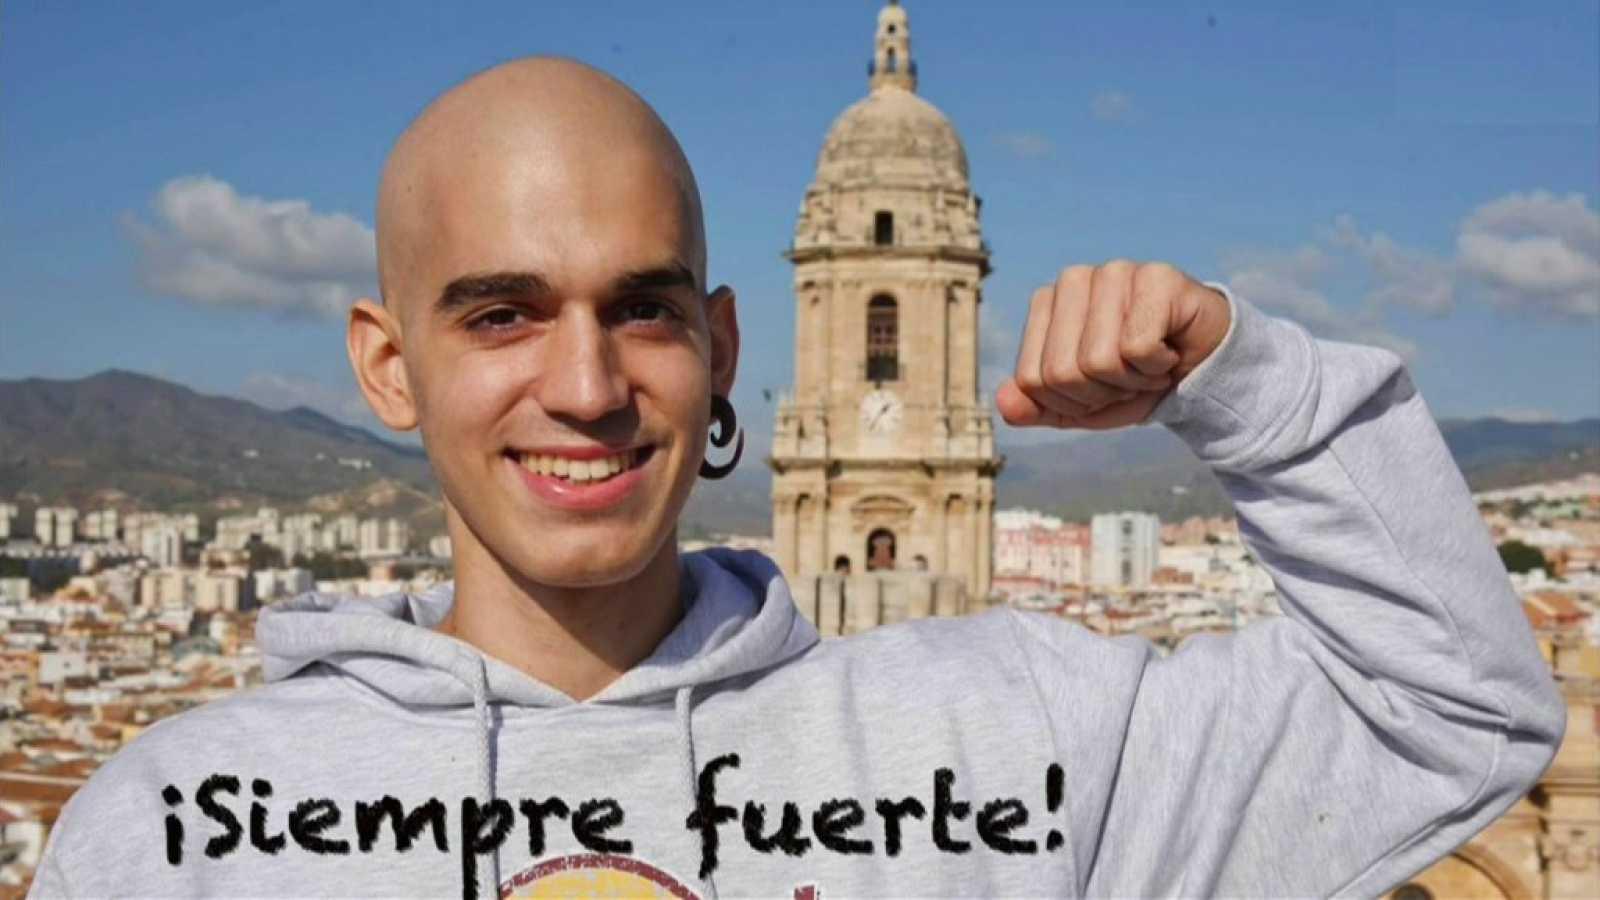 Atletismo - Documental '1000 Km contra la Leucemia' - ver ahora